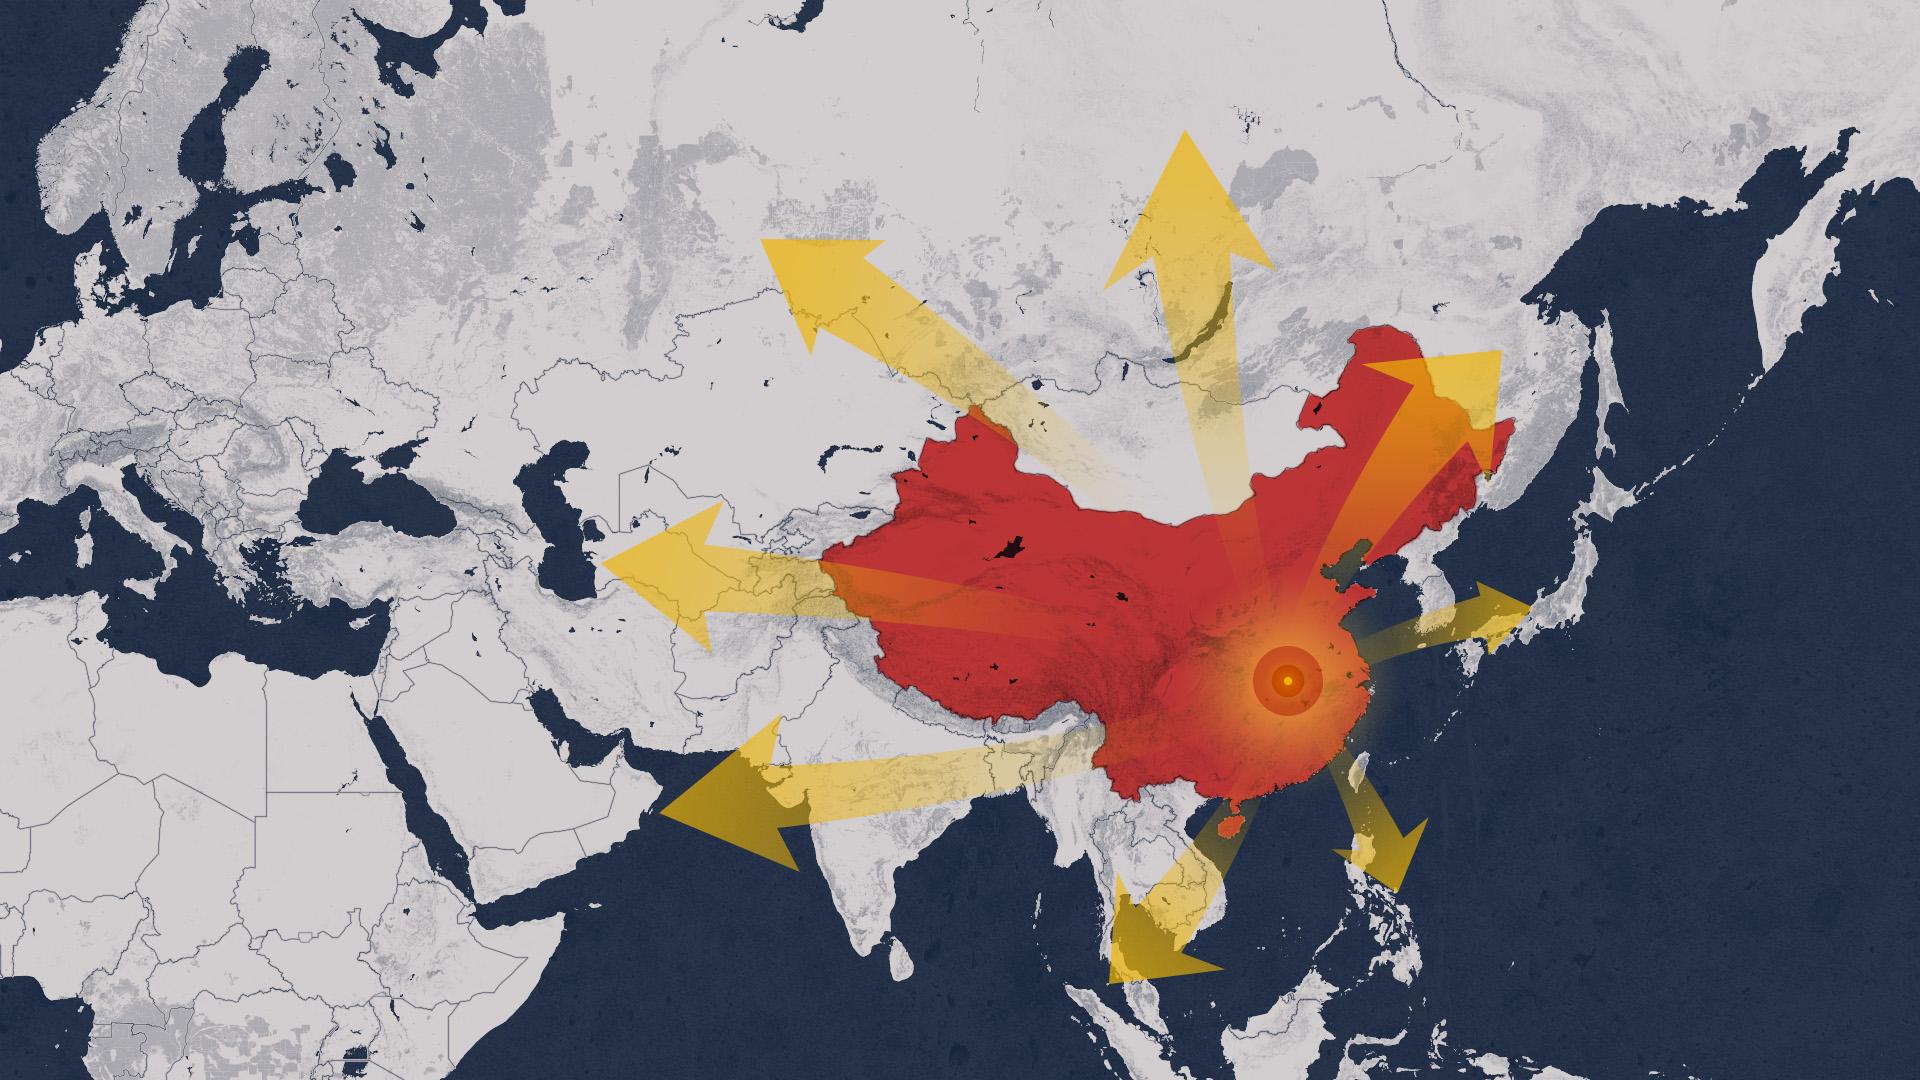 Koronavirus Mapa Projdete Si Jakym Tempem Postupuje Seznam